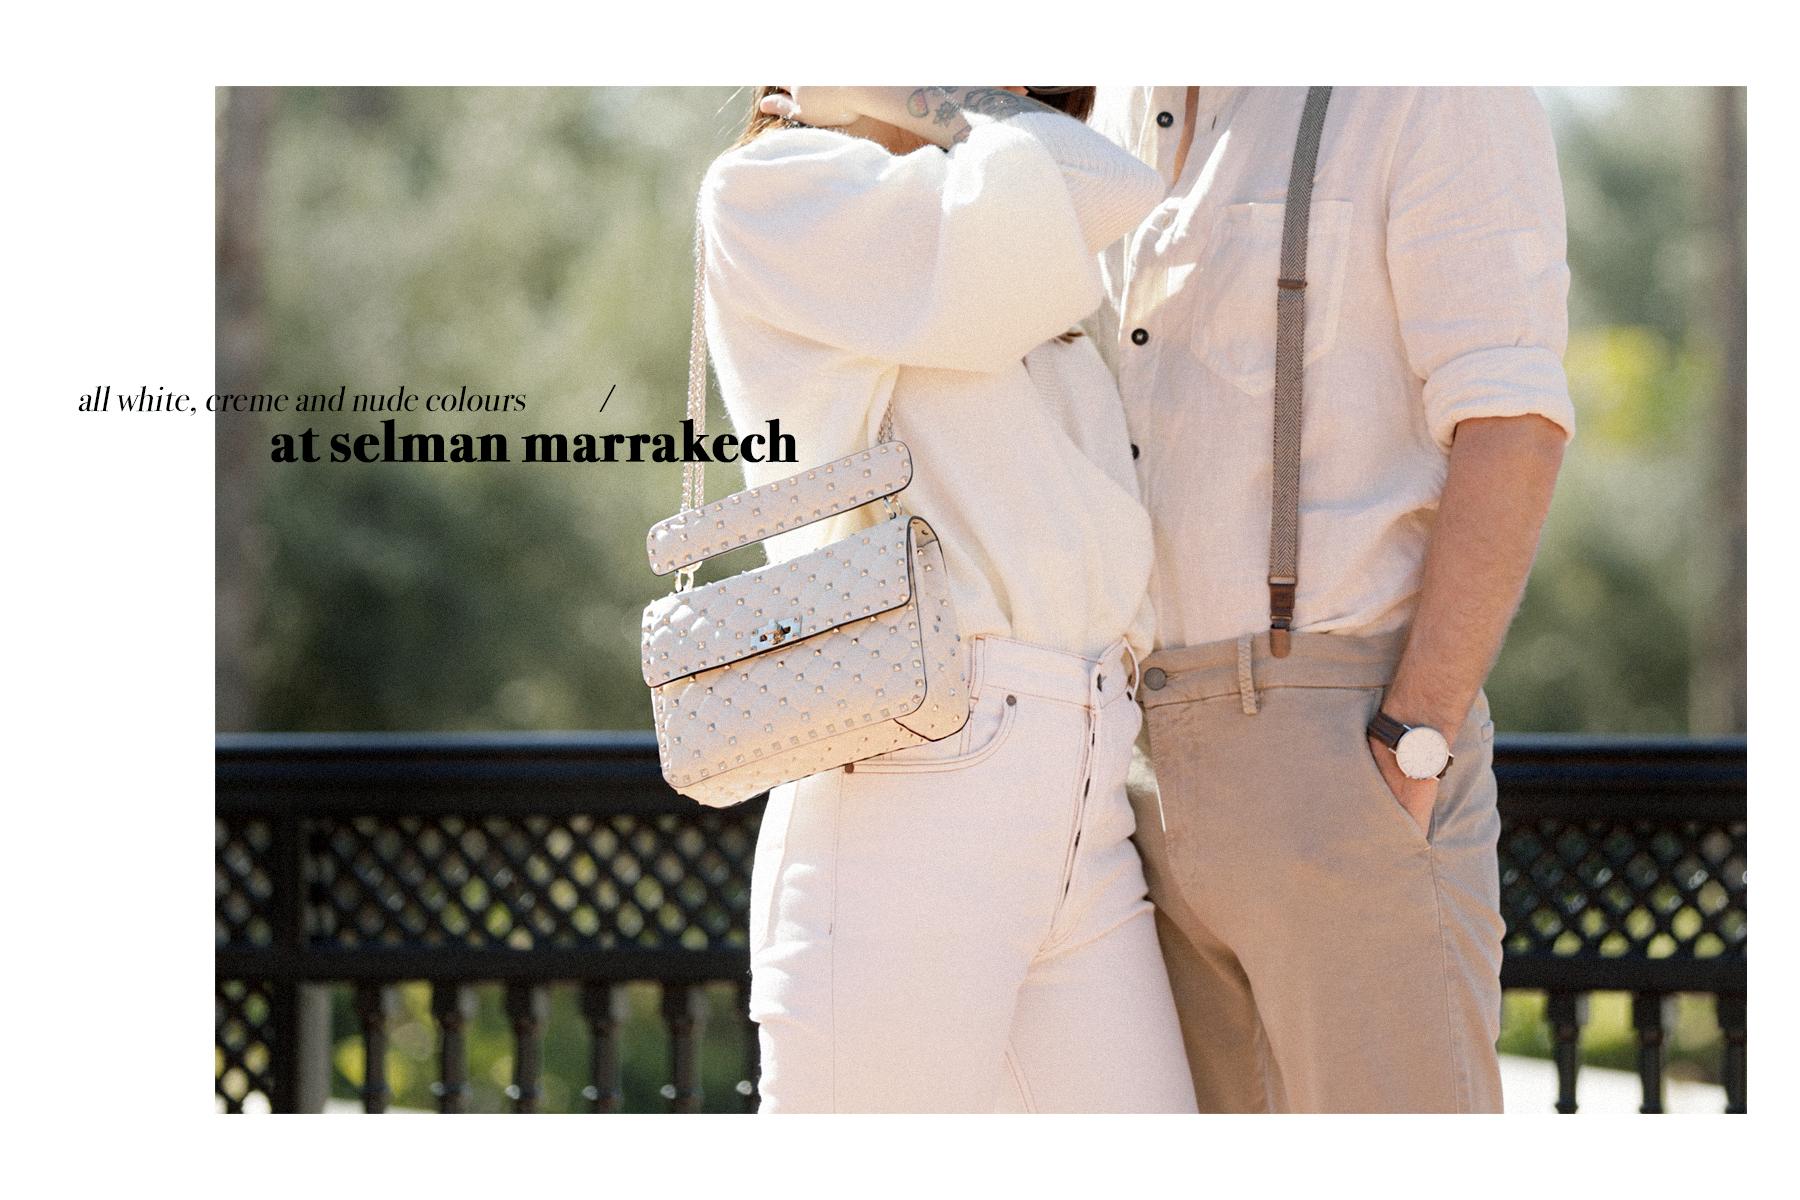 outfit couple couplebloggers couplegoals couples romance romantic allwhite outfitblogger breuninger düsseldorf maison valentino persol ricarda schernus max bechmann catsanddogsblog modeblogger fashionblogger germany 5